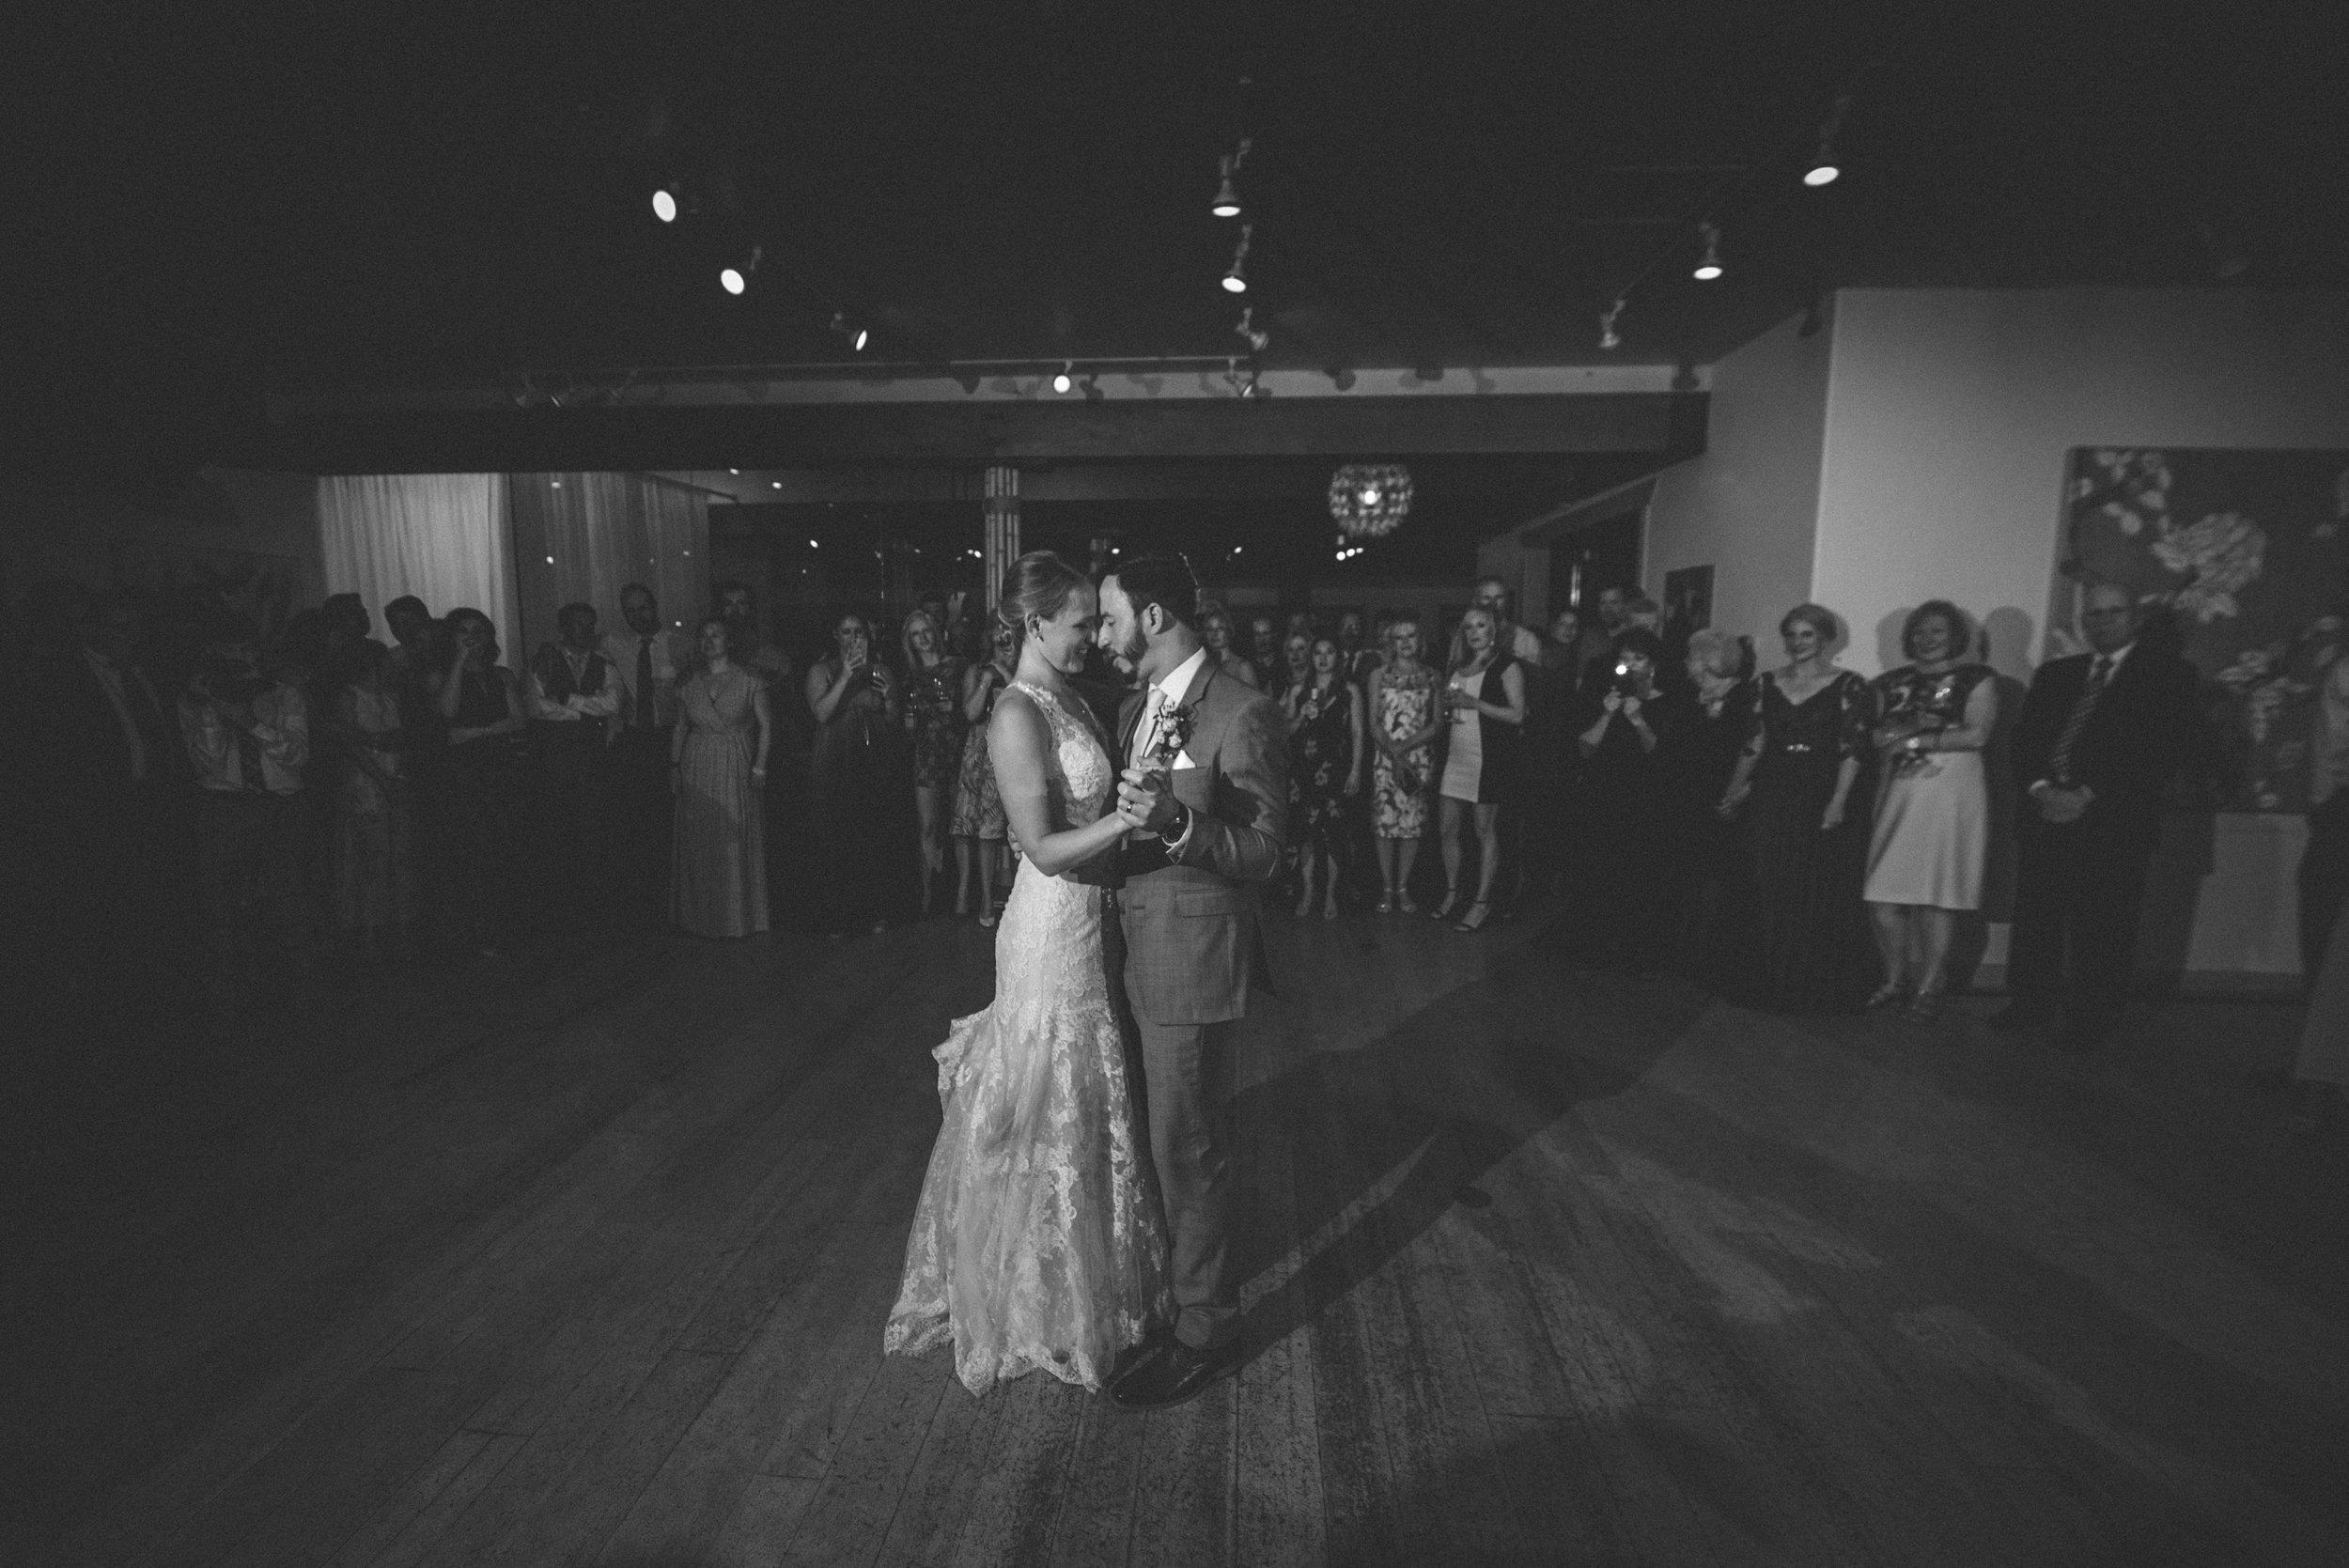 ChadFahnestockPhotography-mc-wedding-024.jpg